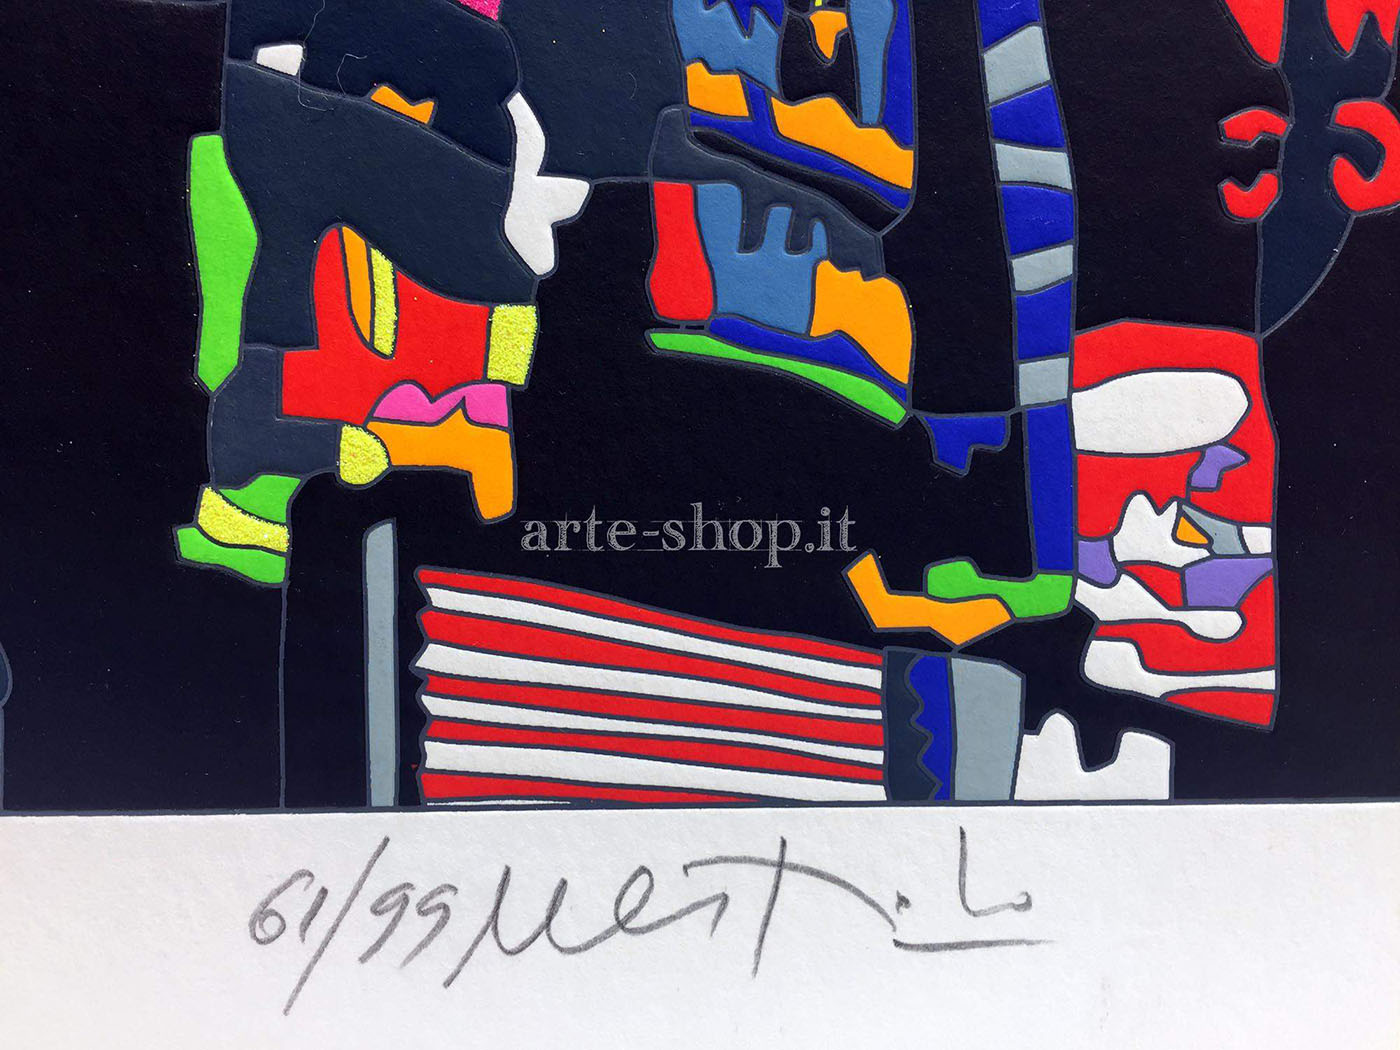 arte pentagono shop dettaglio numero 233